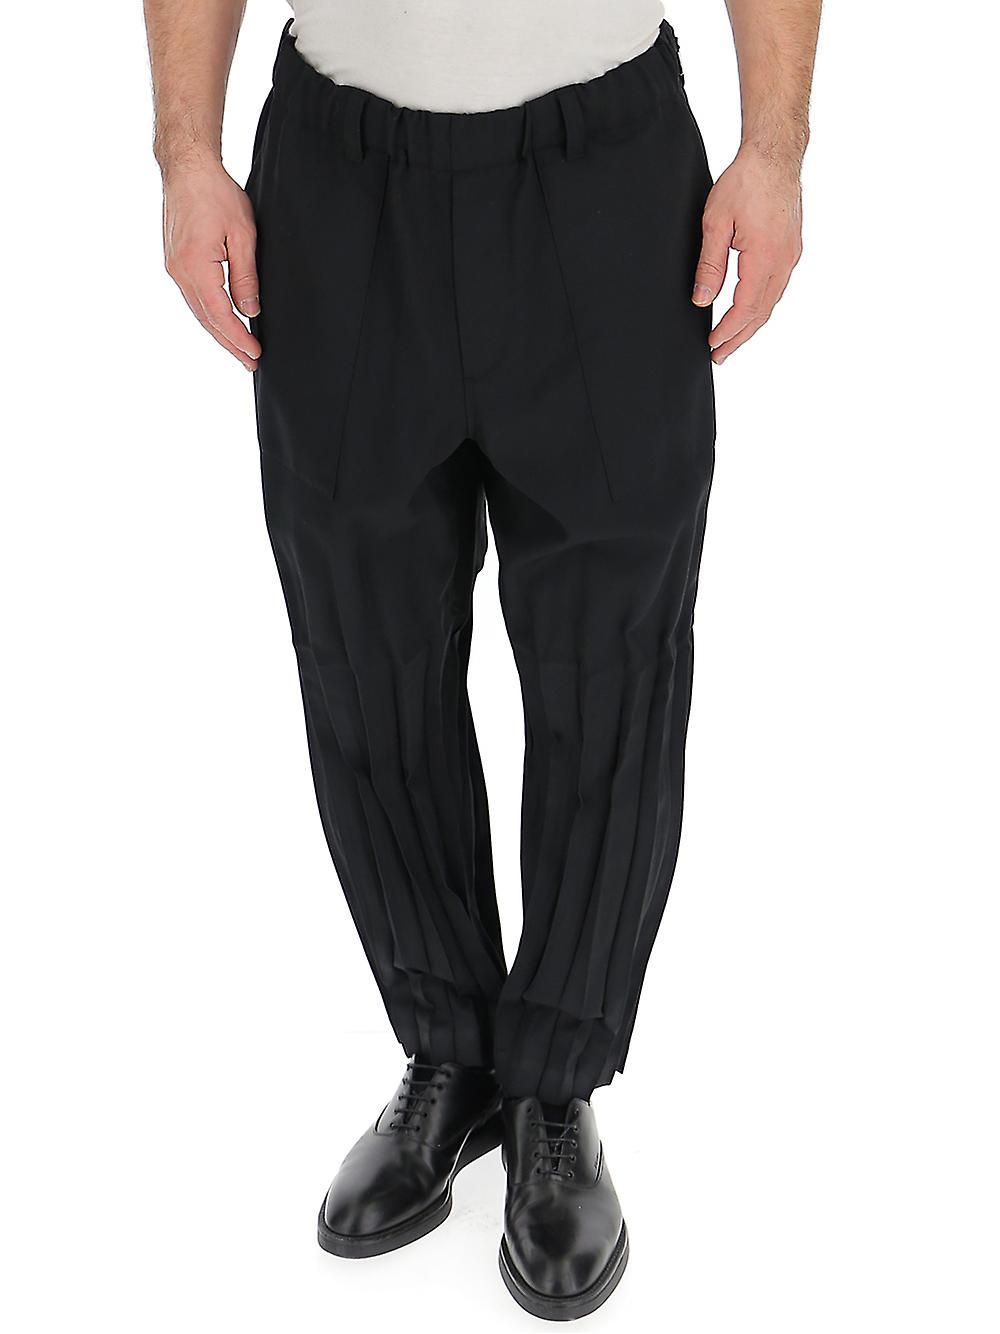 Issey Miyake Black Polyester Pants